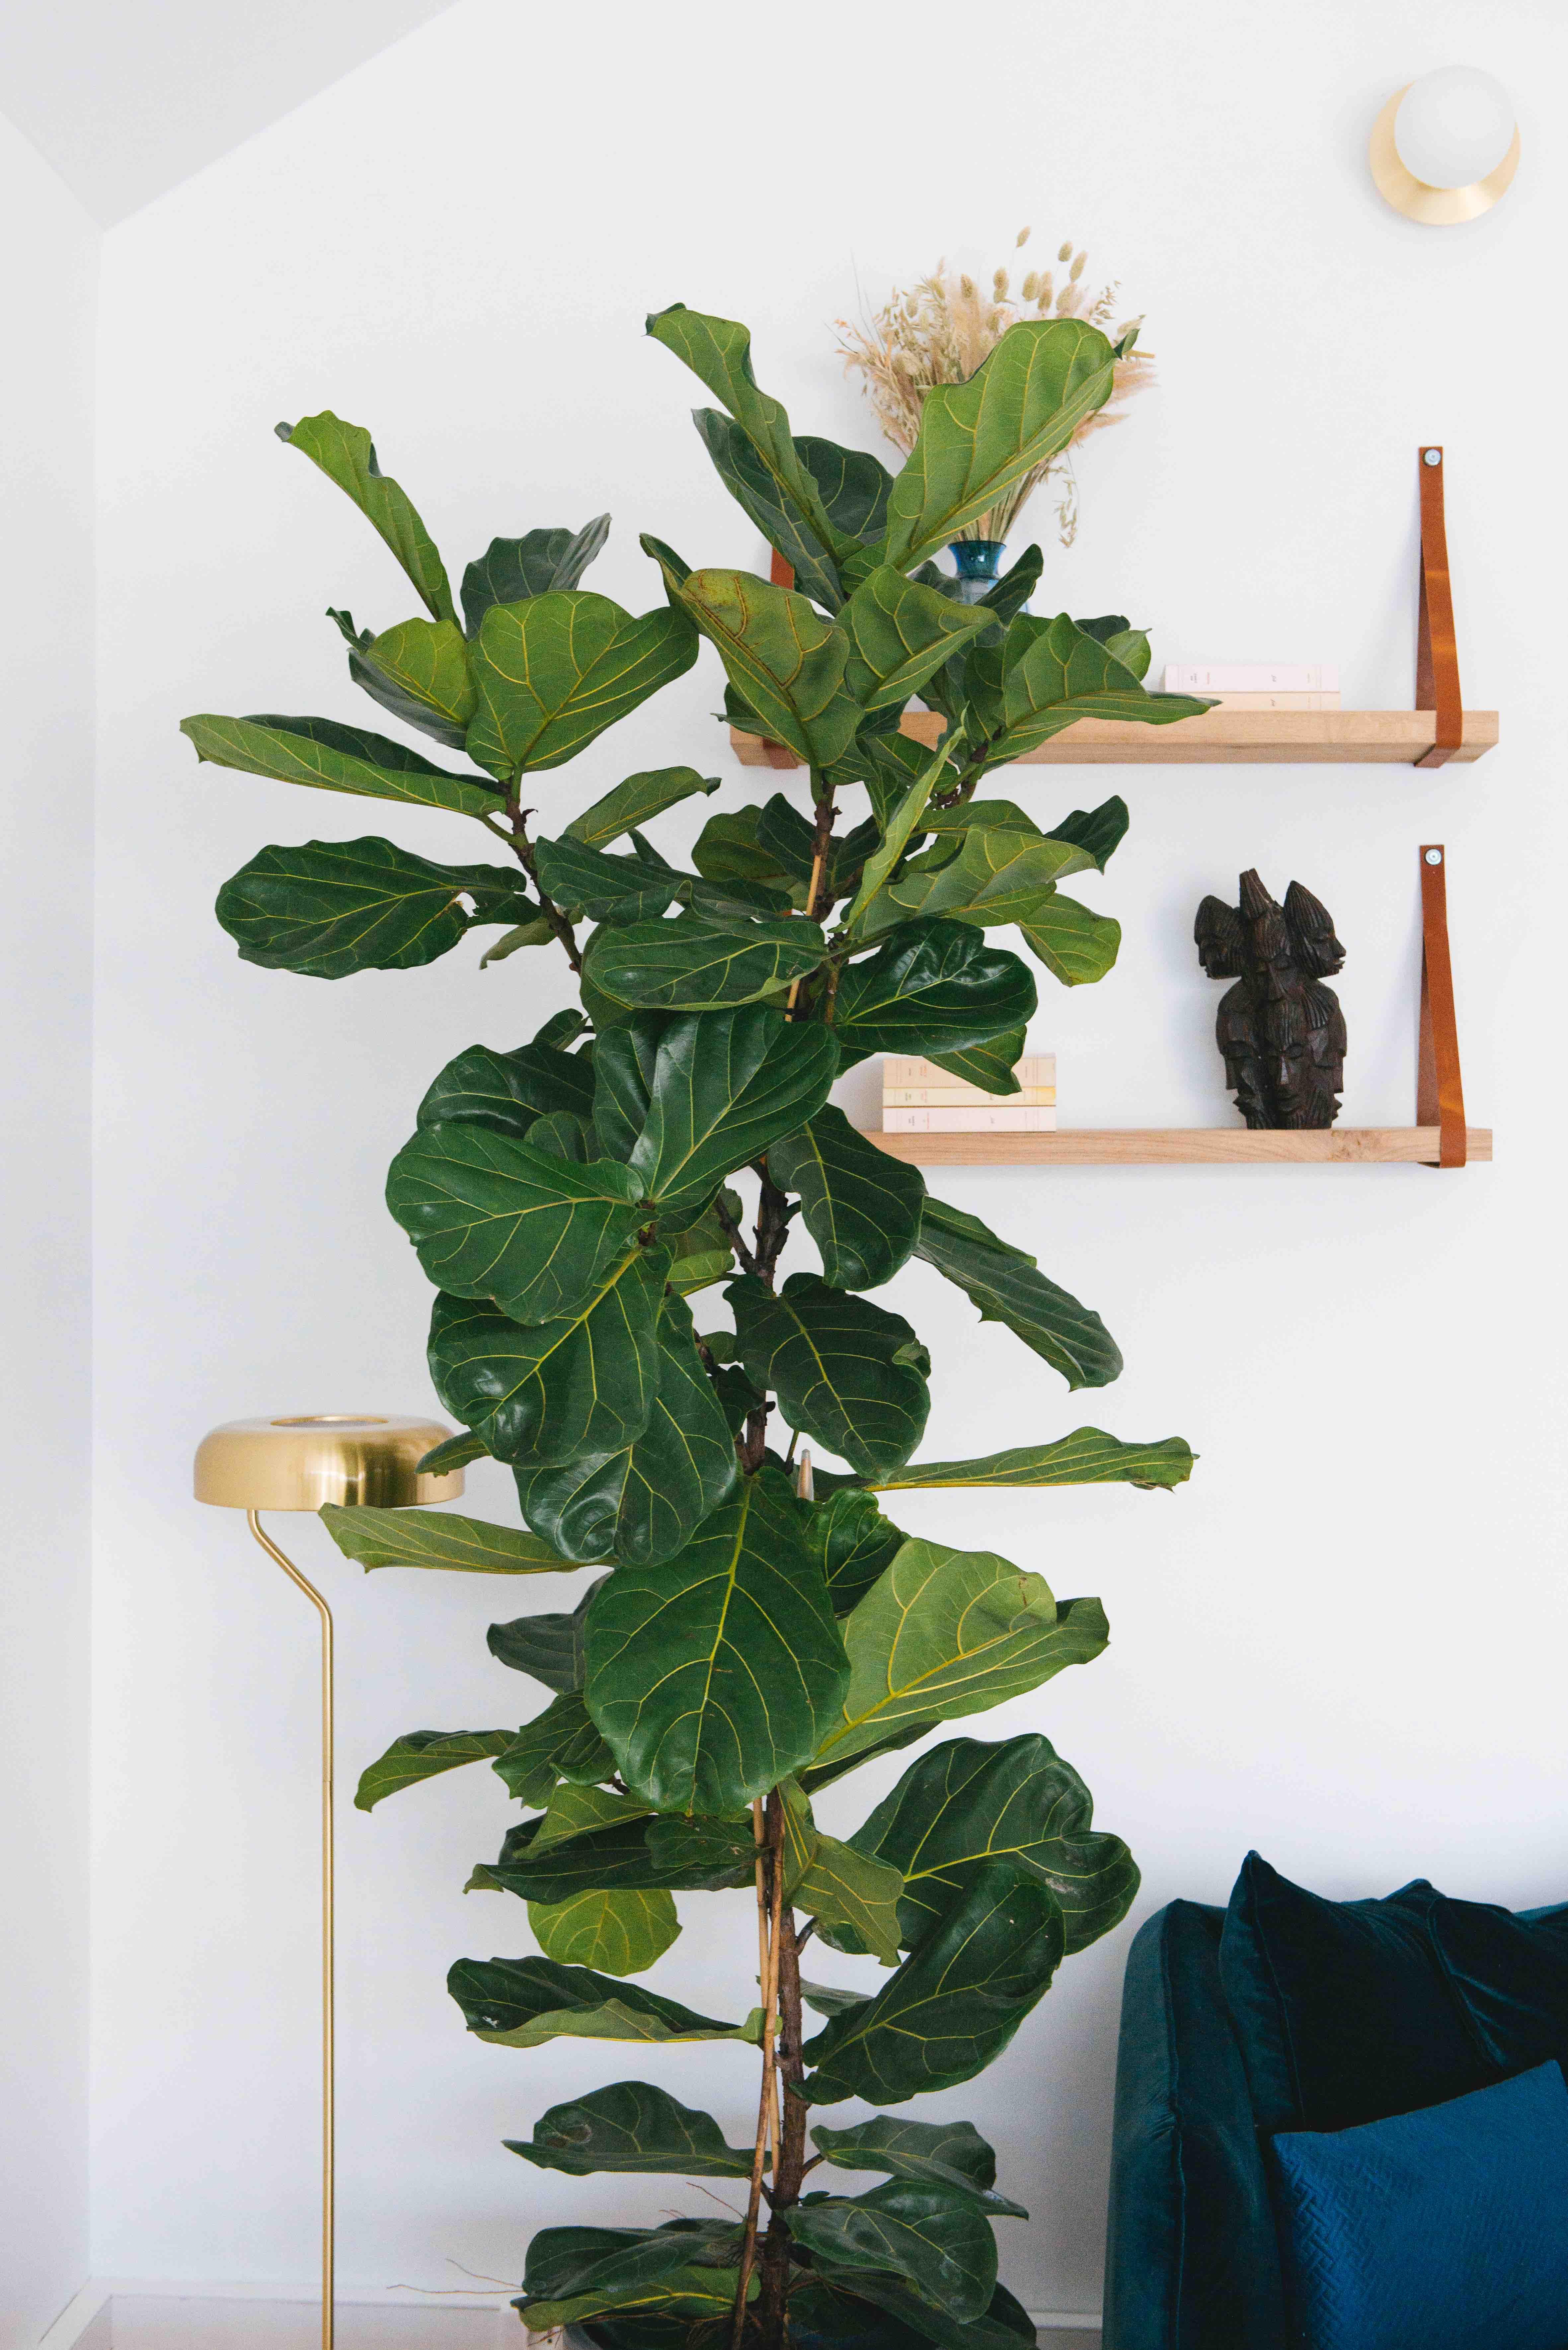 ficus lyrata grande plante bureau végétalisation paris